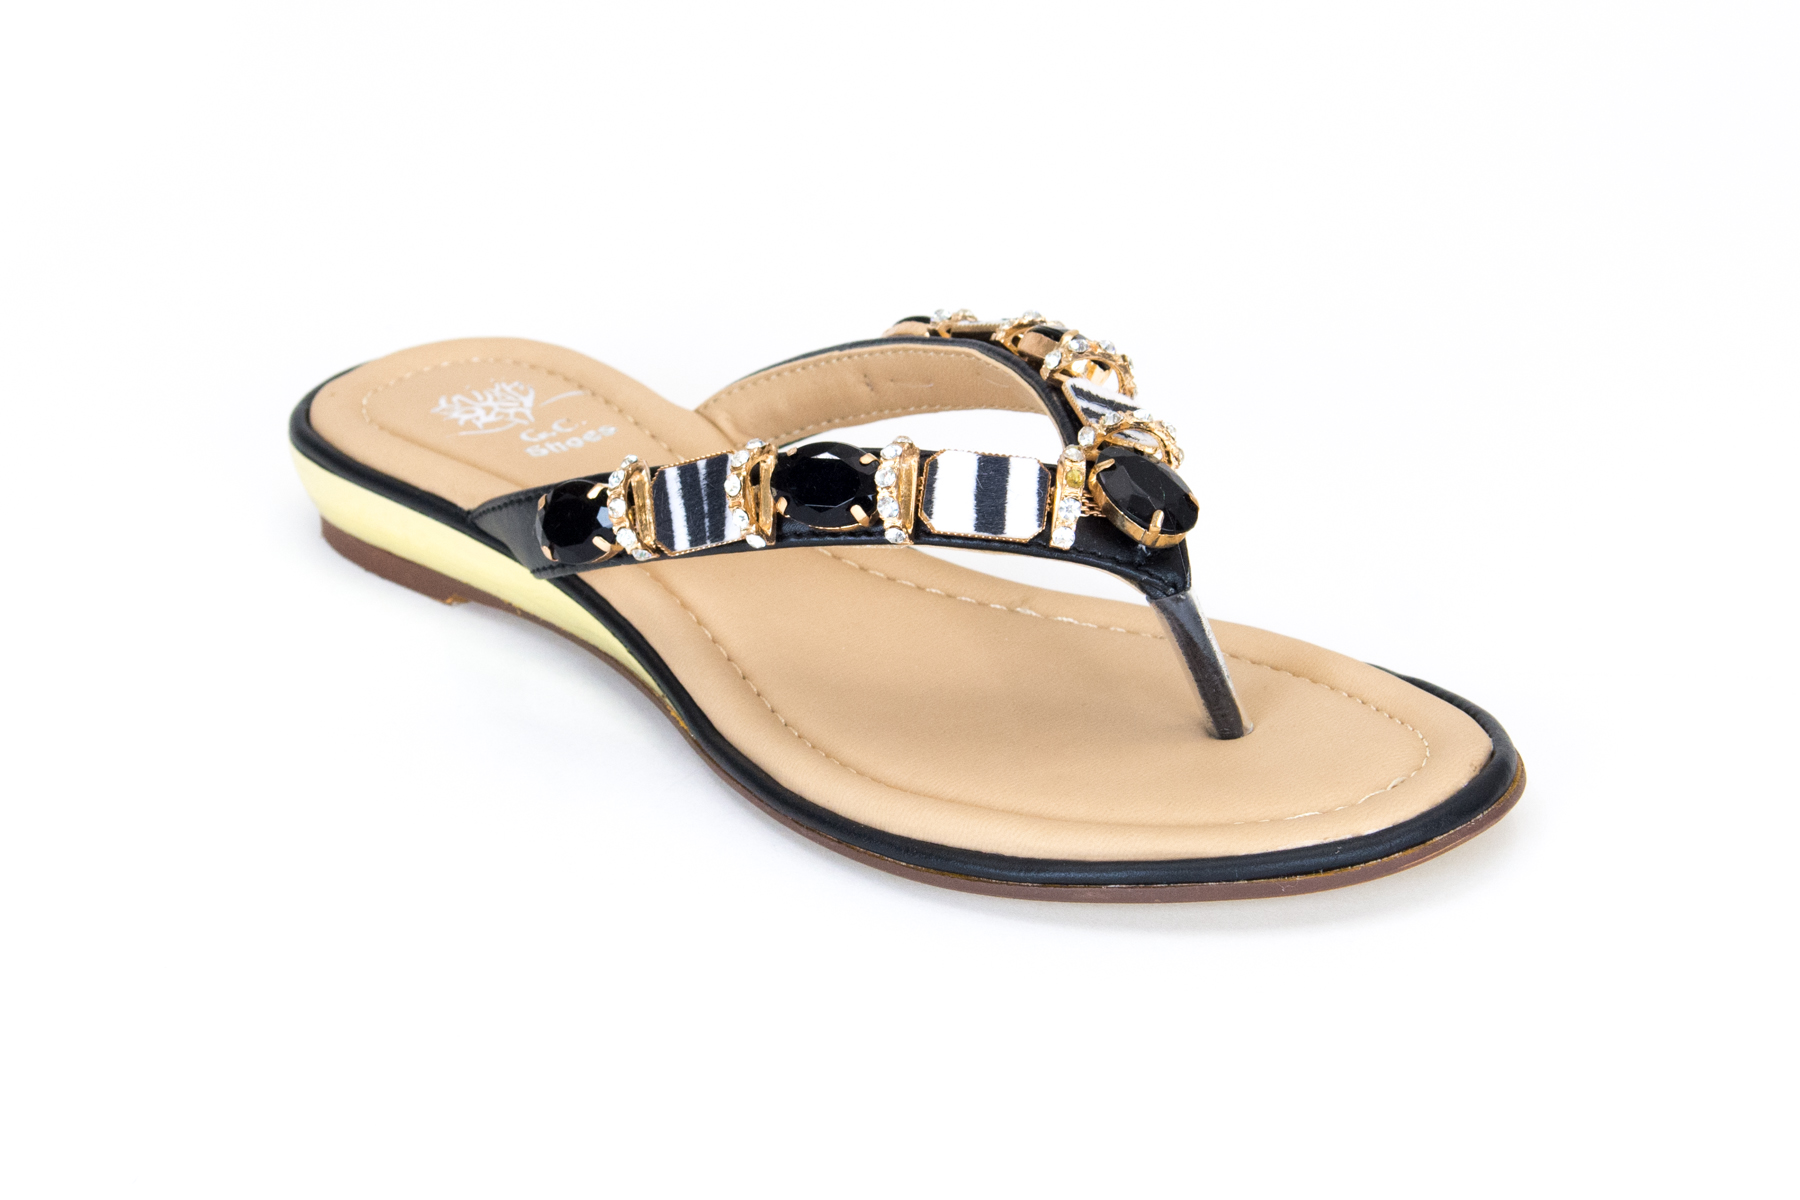 Thong Sandal with Rhinestones